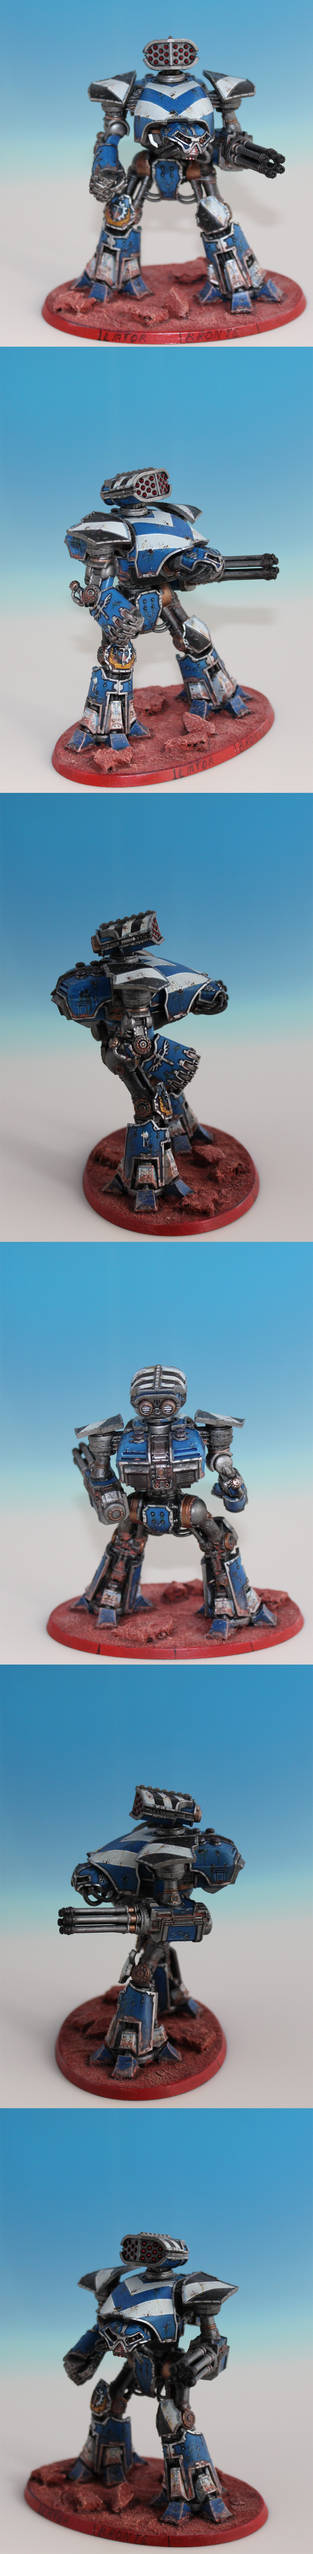 Reaver Battle Titan Lator Bronte